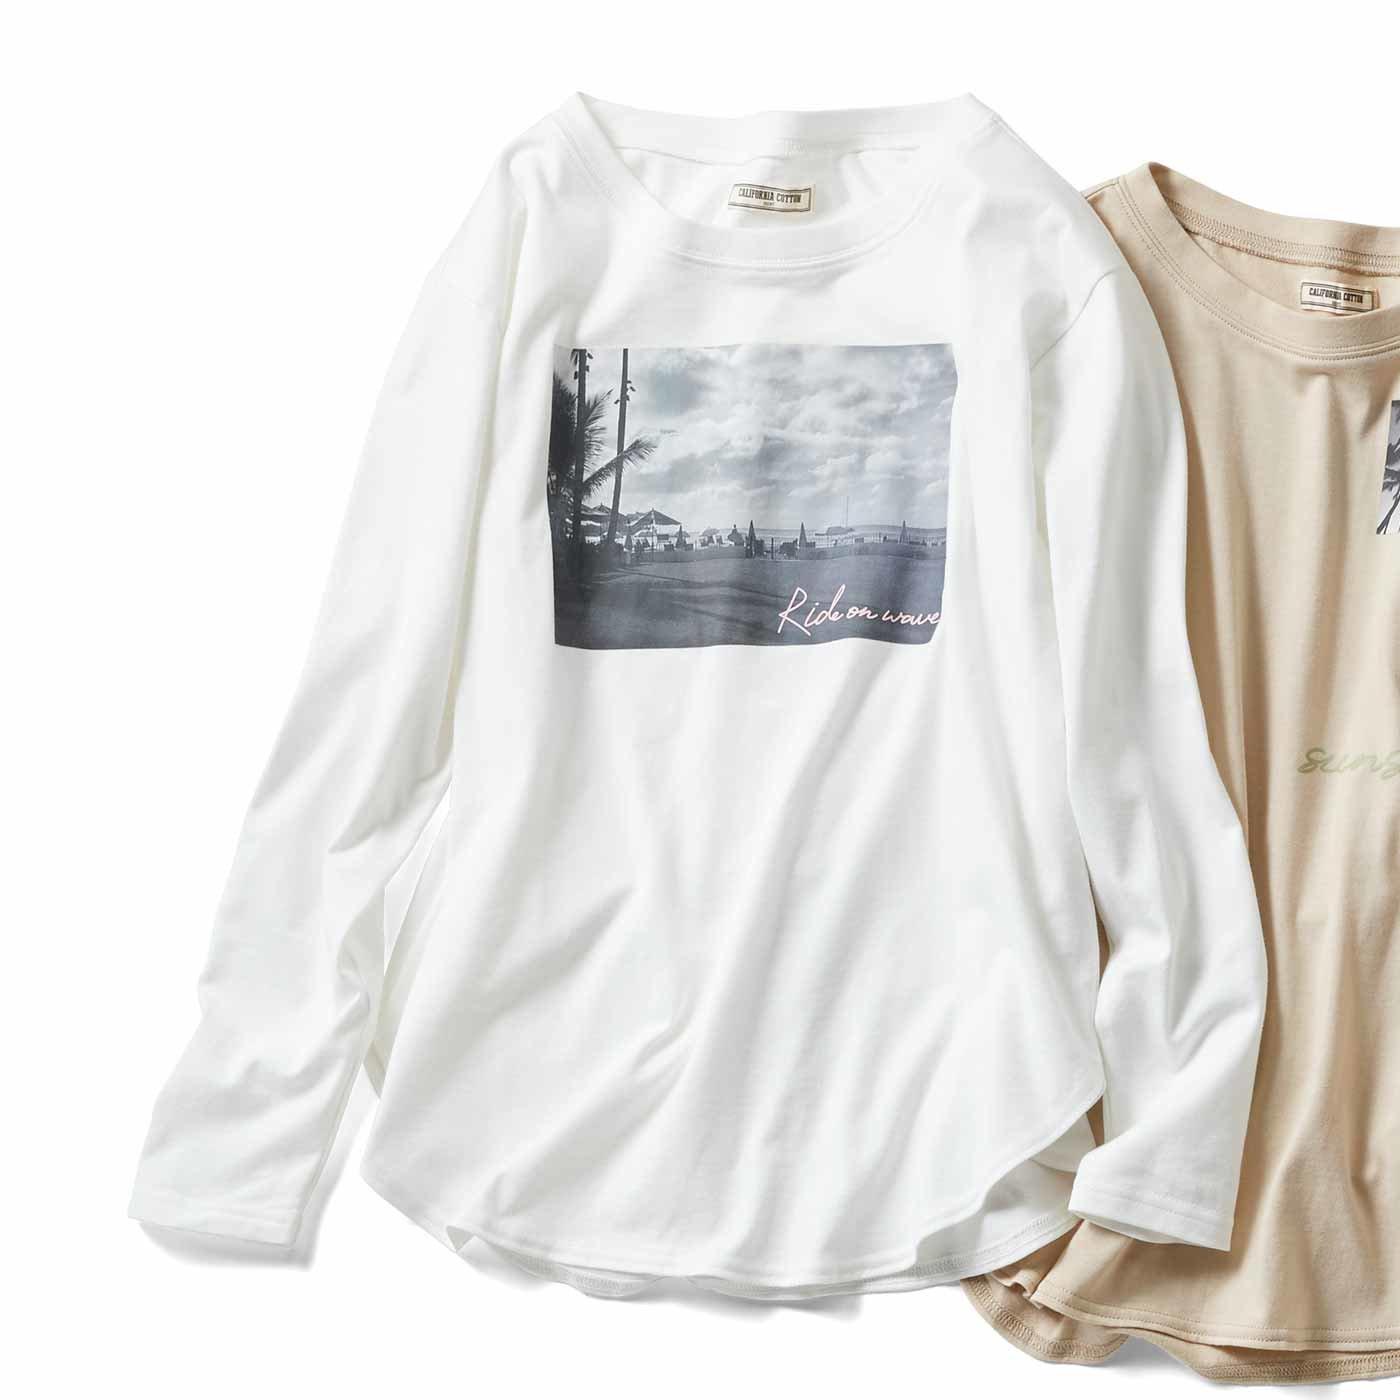 IEDIT[イディット] カリフォルニアコットンのフォトプリントTシャツの会